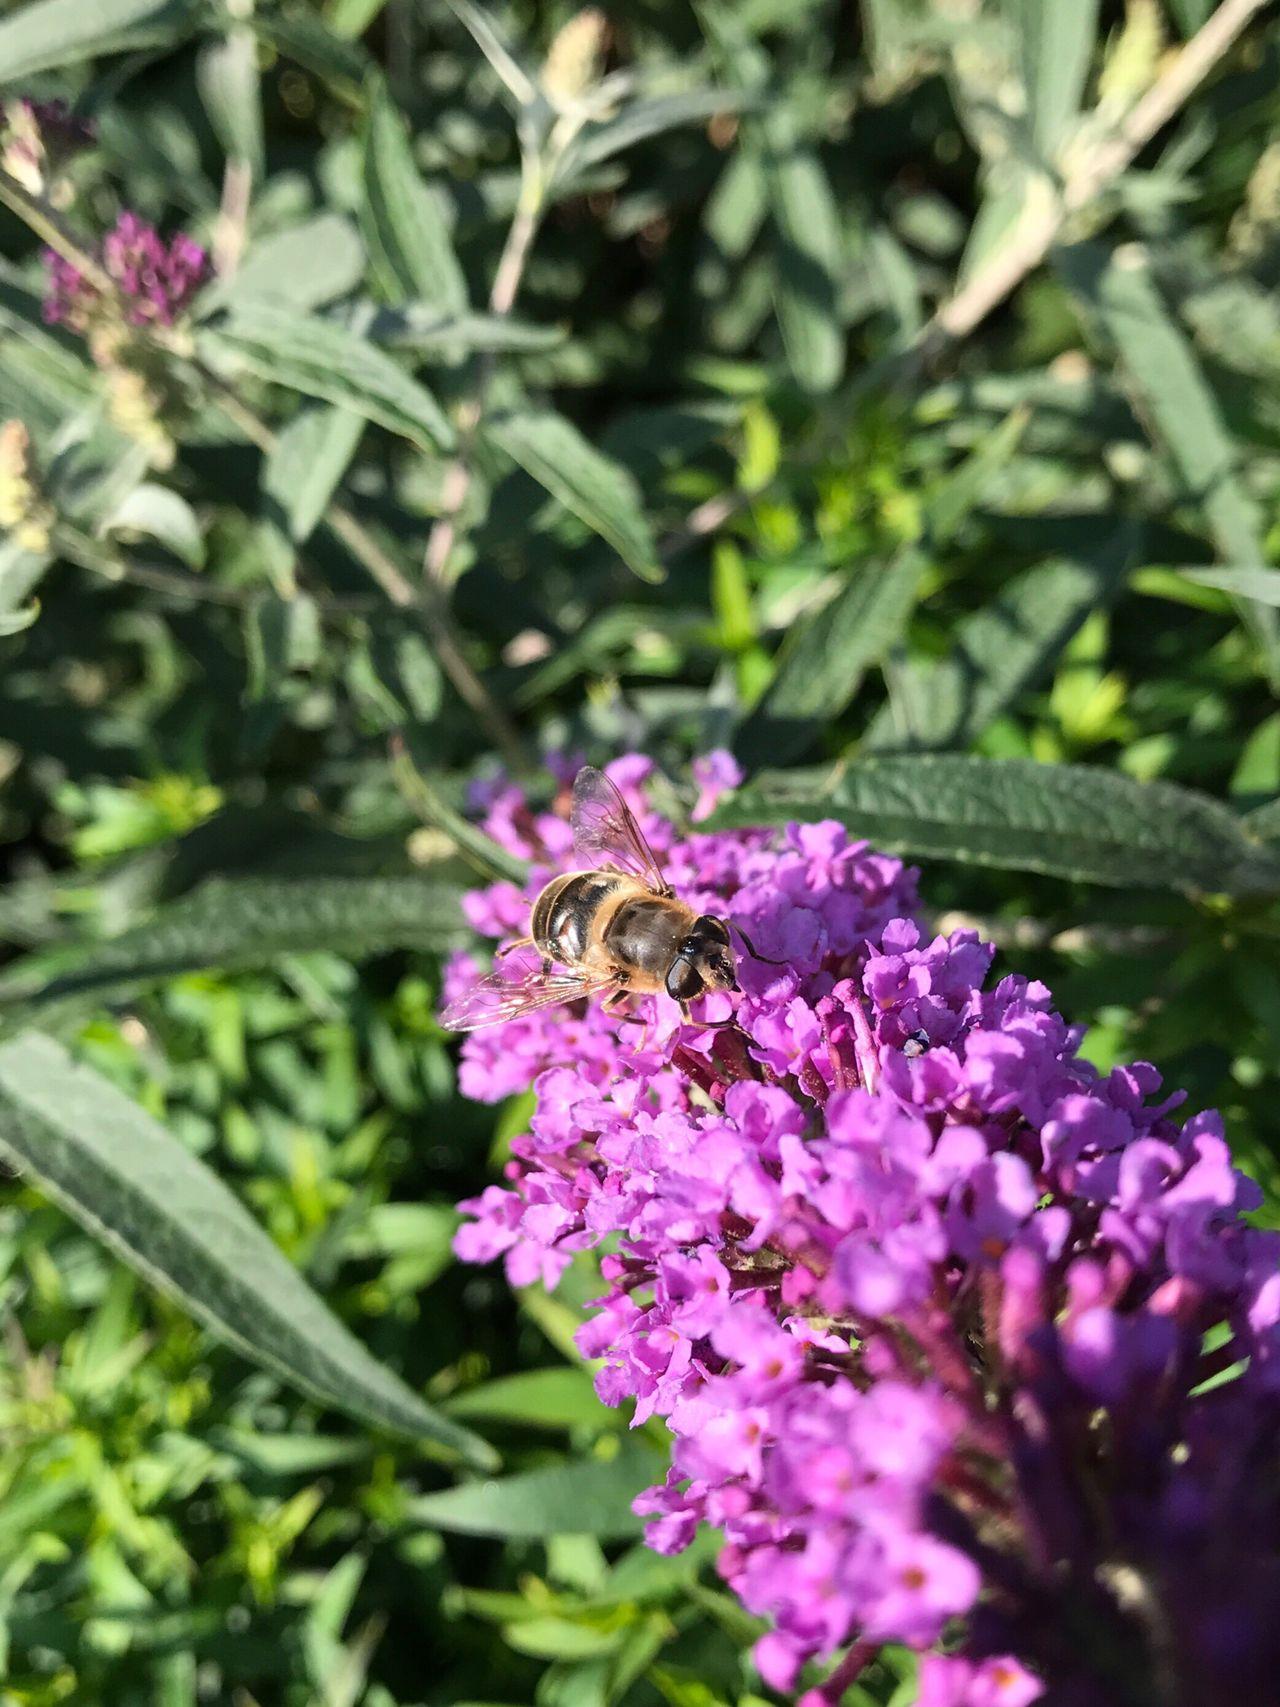 Honey Bee Honey Bees  Honeybee On Flower Buddleia IPhone IPhoneography IPhone Photography My Garden @my Home My Garden Flowers, Nature And Beauty Flowers,Plants & Garden